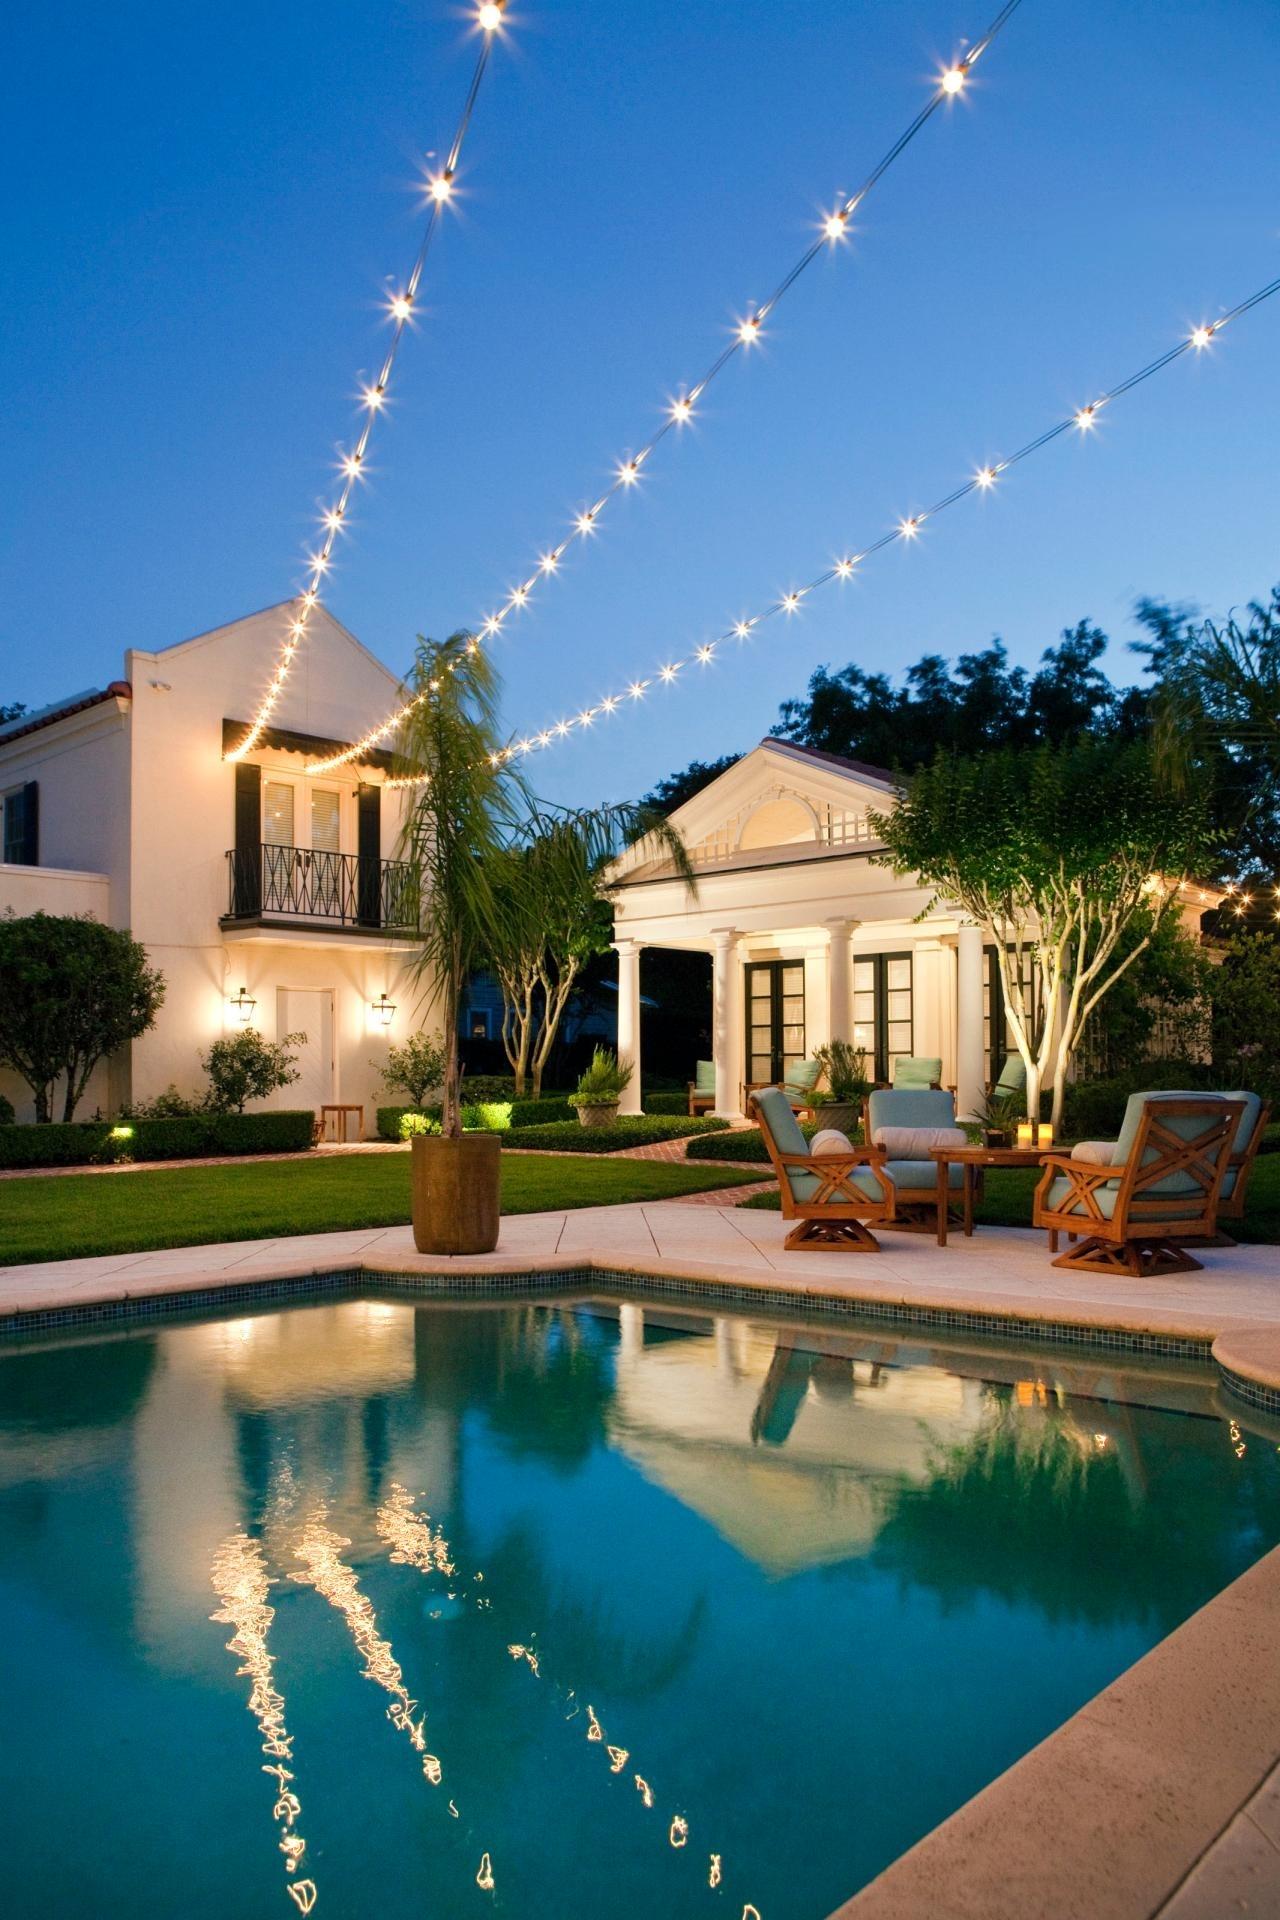 Popular Photo of Outdoor Hanging Pool Lights